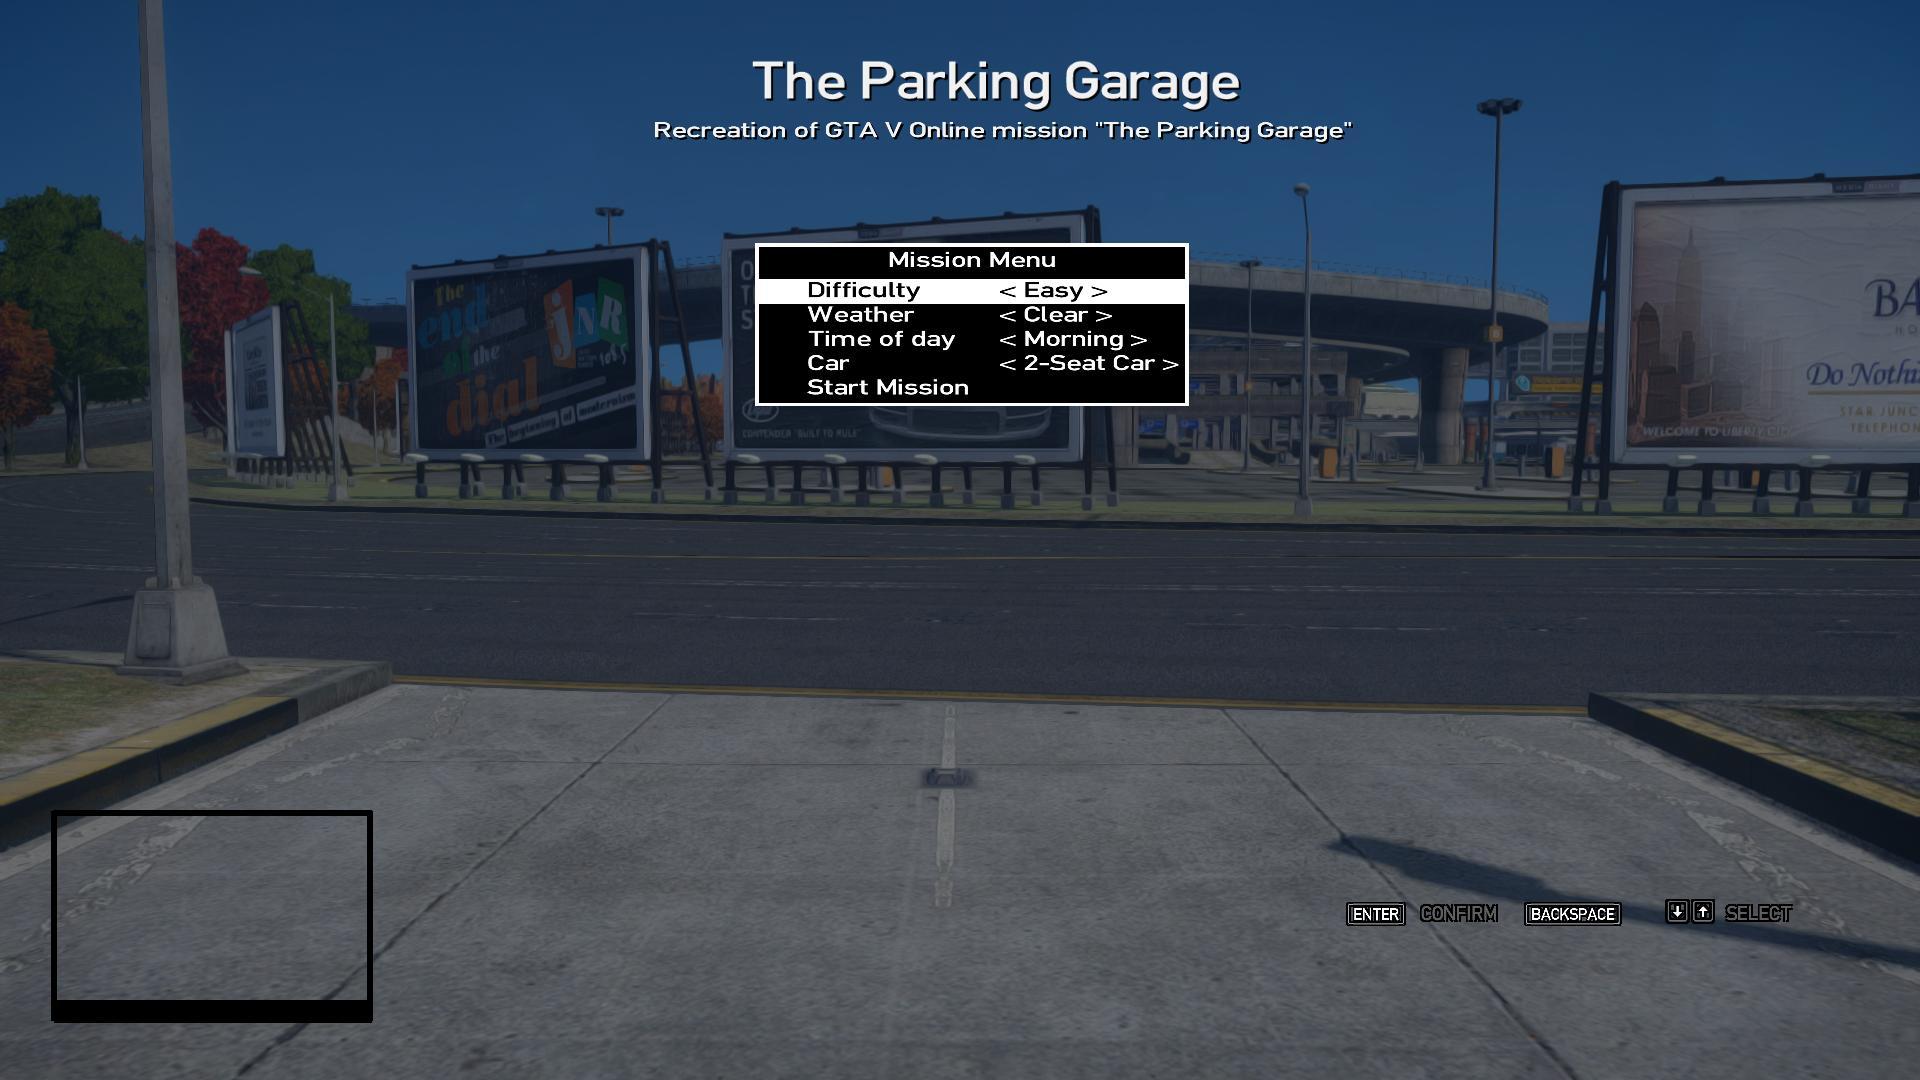 GTAGarage com » GTA IV Mission Mod Pack » View Screenshot